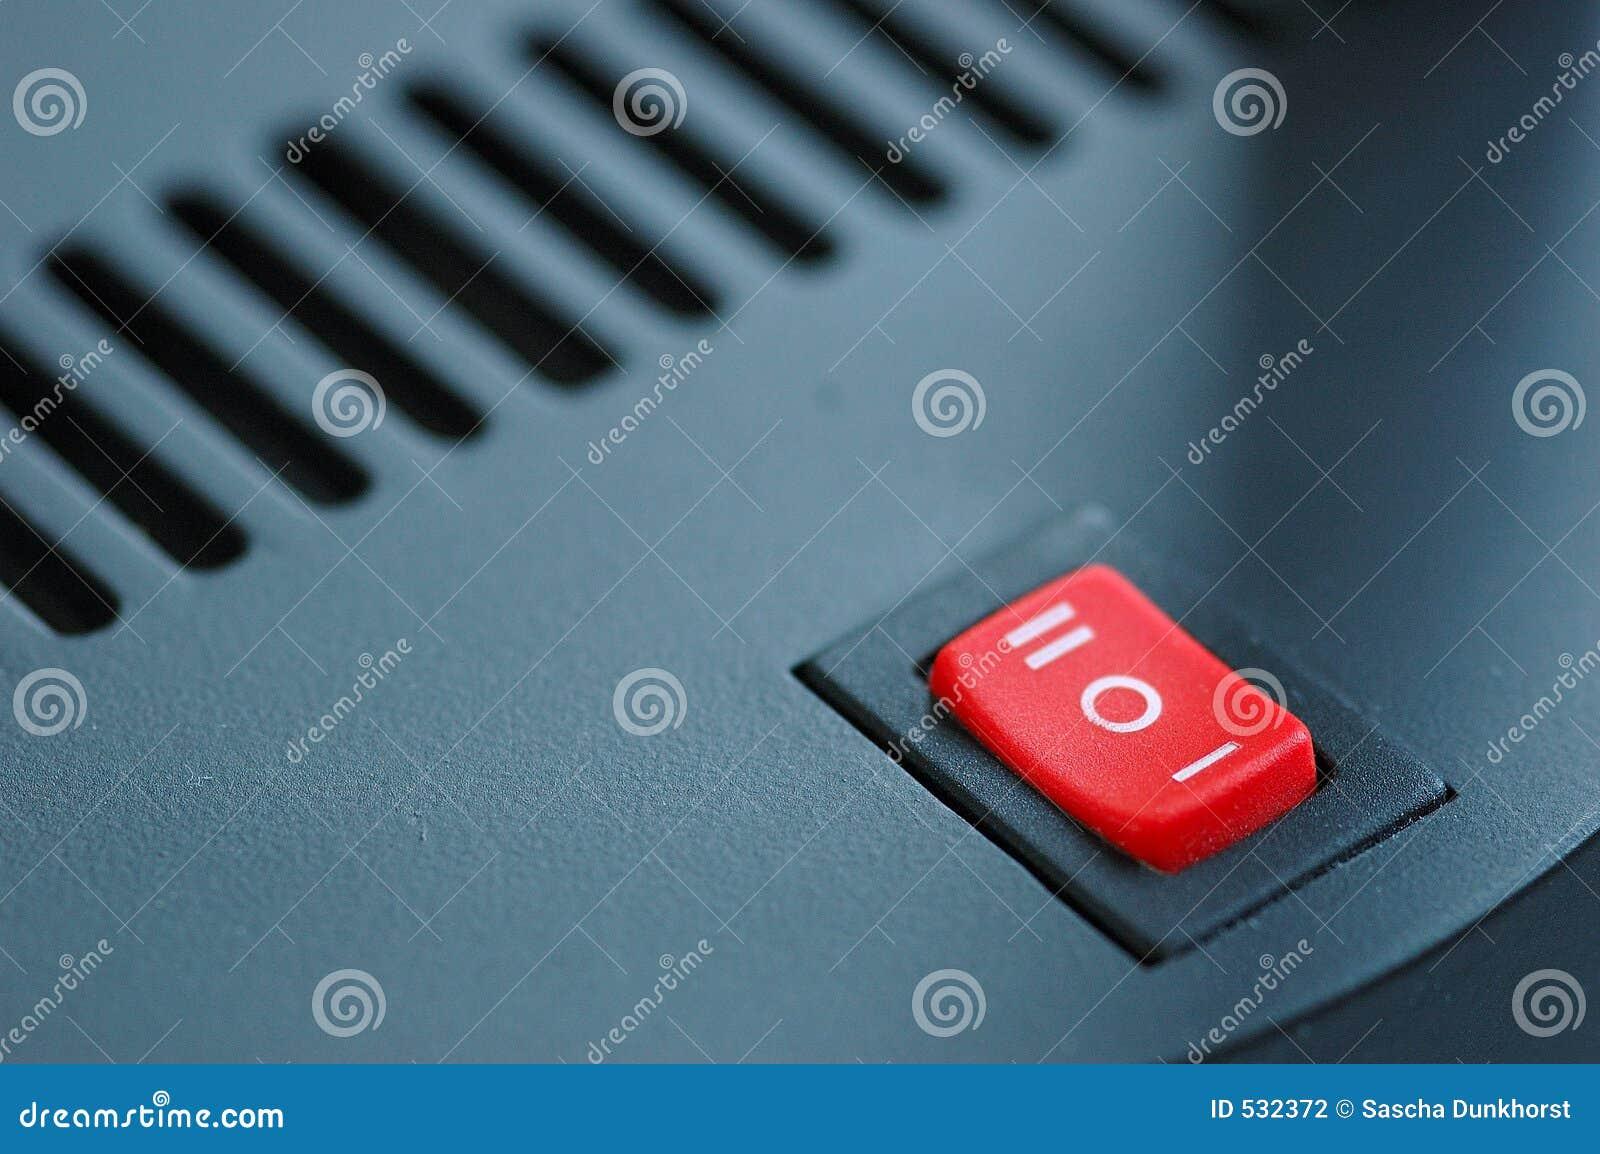 Download 切换 库存照片. 图片 包括有 波纹, 确定, 闪亮指示, 控制, 插件, äº, 切换, 按钮, 风扇, 塑料 - 532372